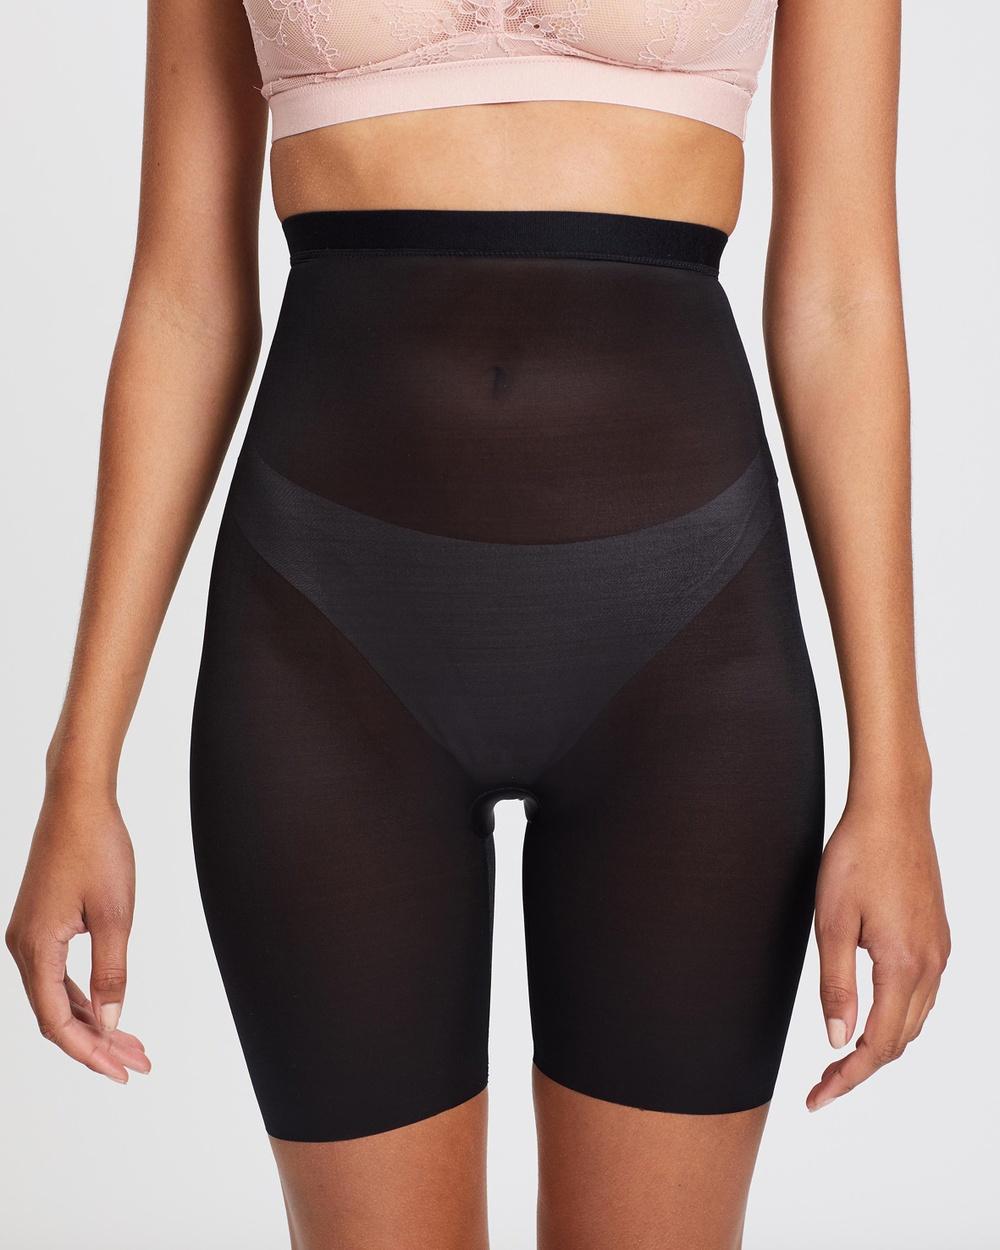 Spanx Skinny Britches High Waist Mid Thigh Shorts Lingerie Very Black High-Waist Mid-Thigh